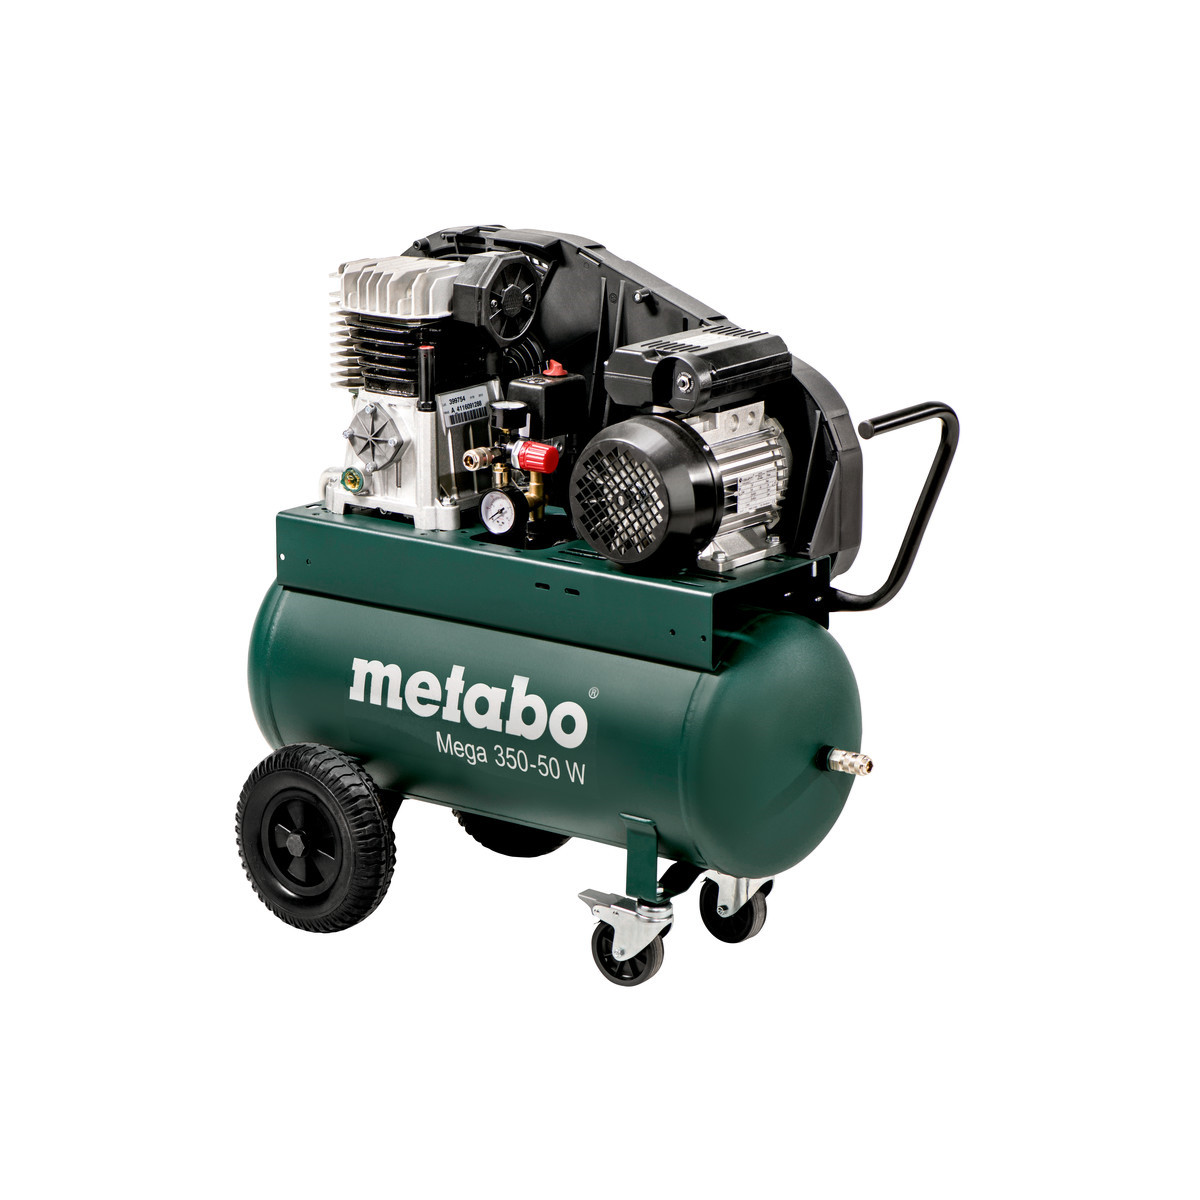 Metabo Trykluftkompressor Mega 350-50 W 50 L 10 Bar